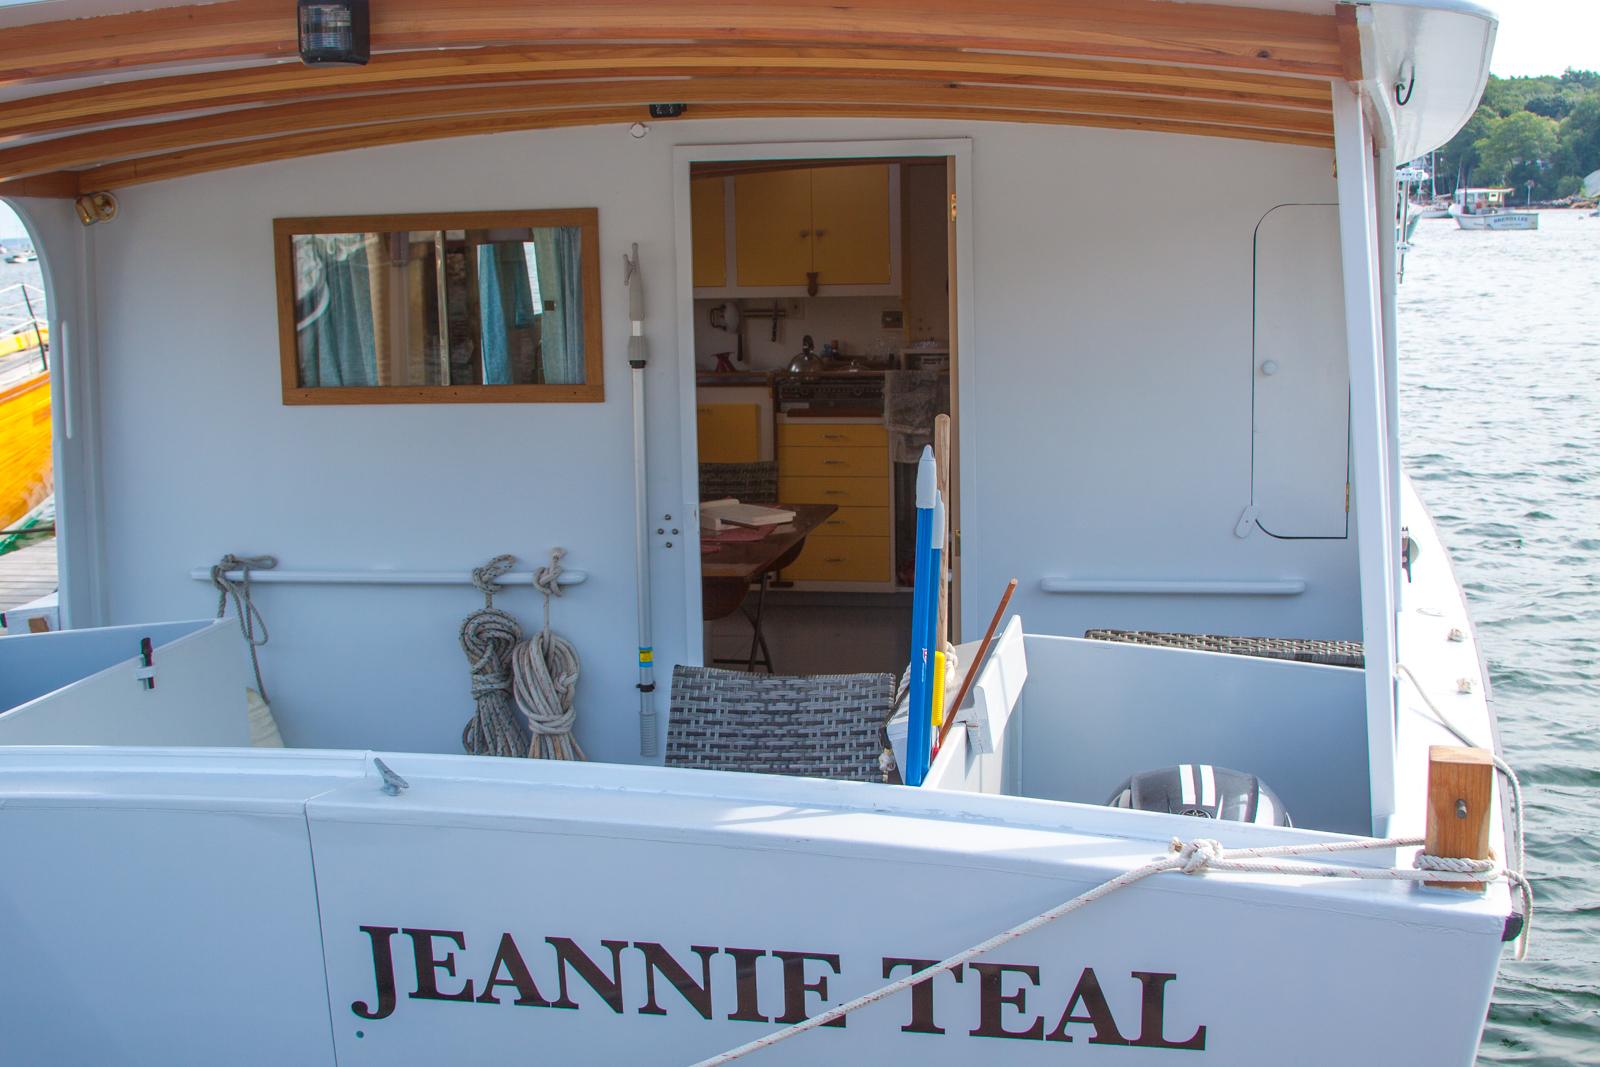 Jeannie Teal close.jpg